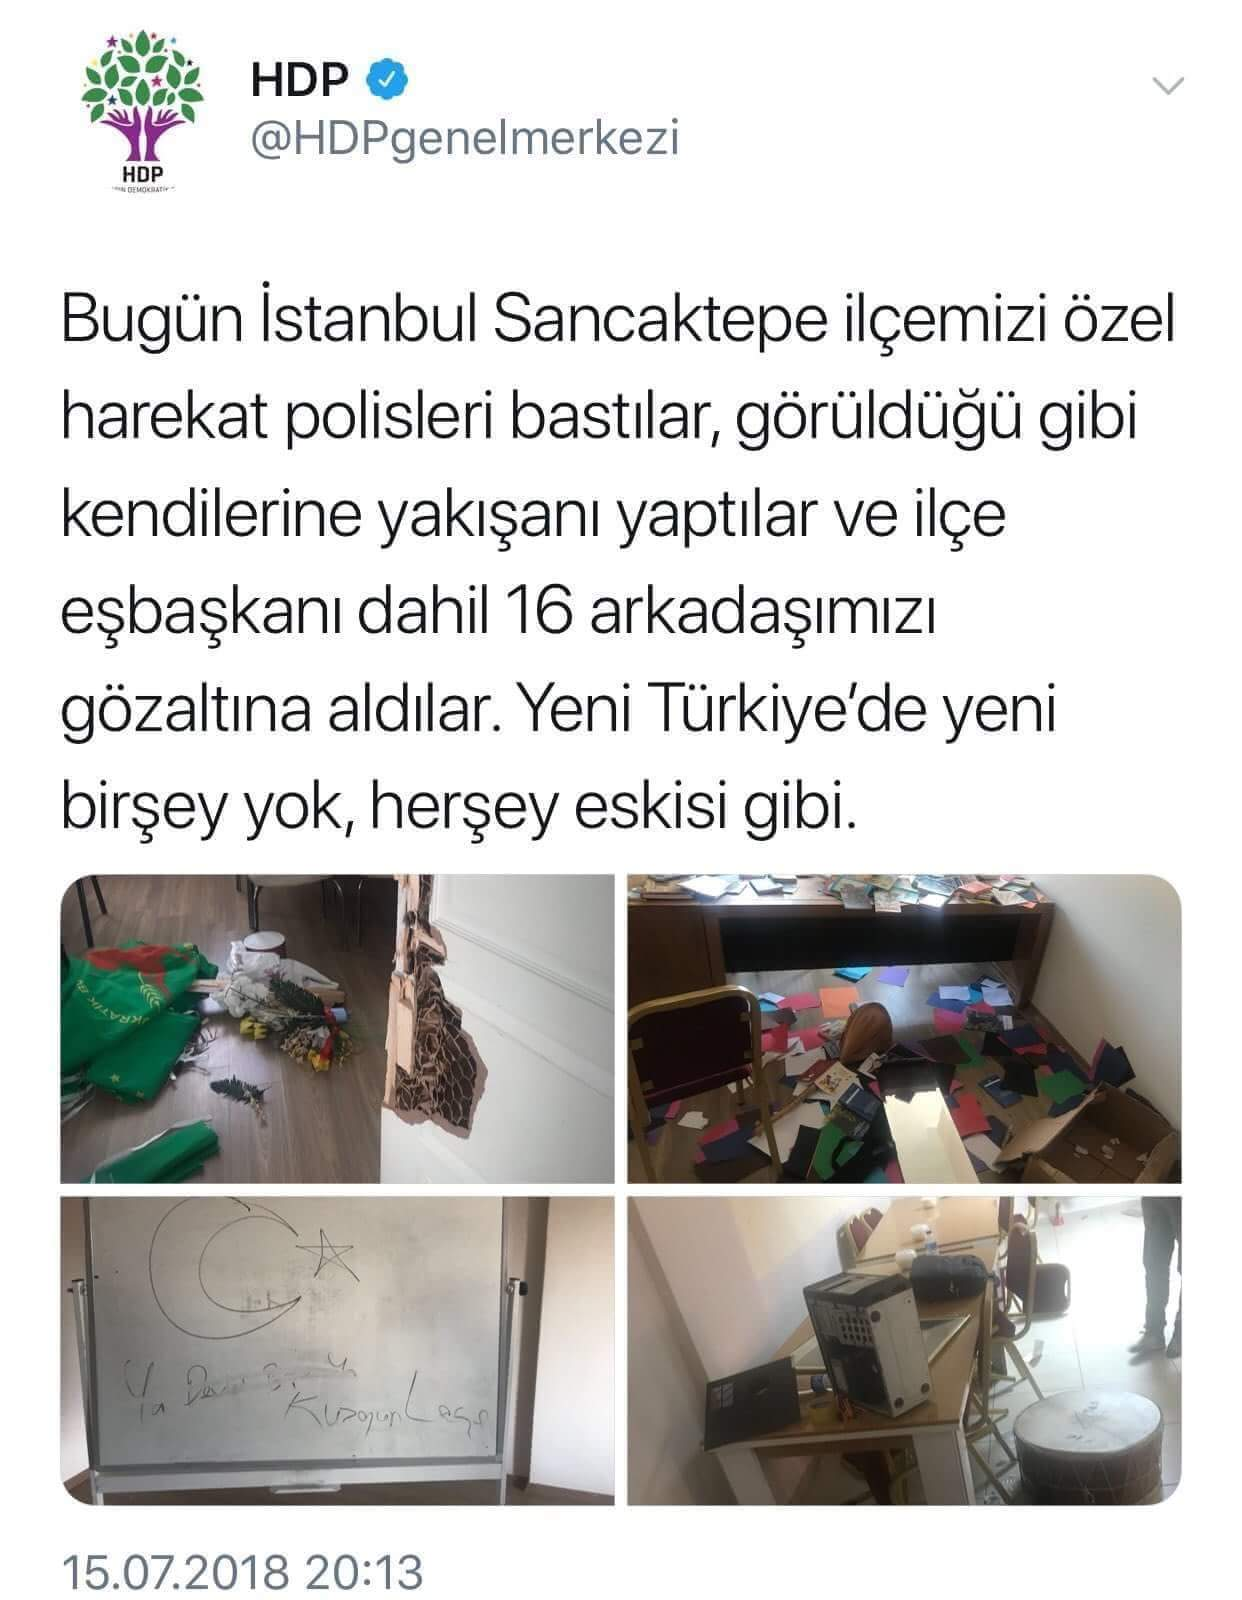 15 temmuz 2018 hdp nin attığı twit